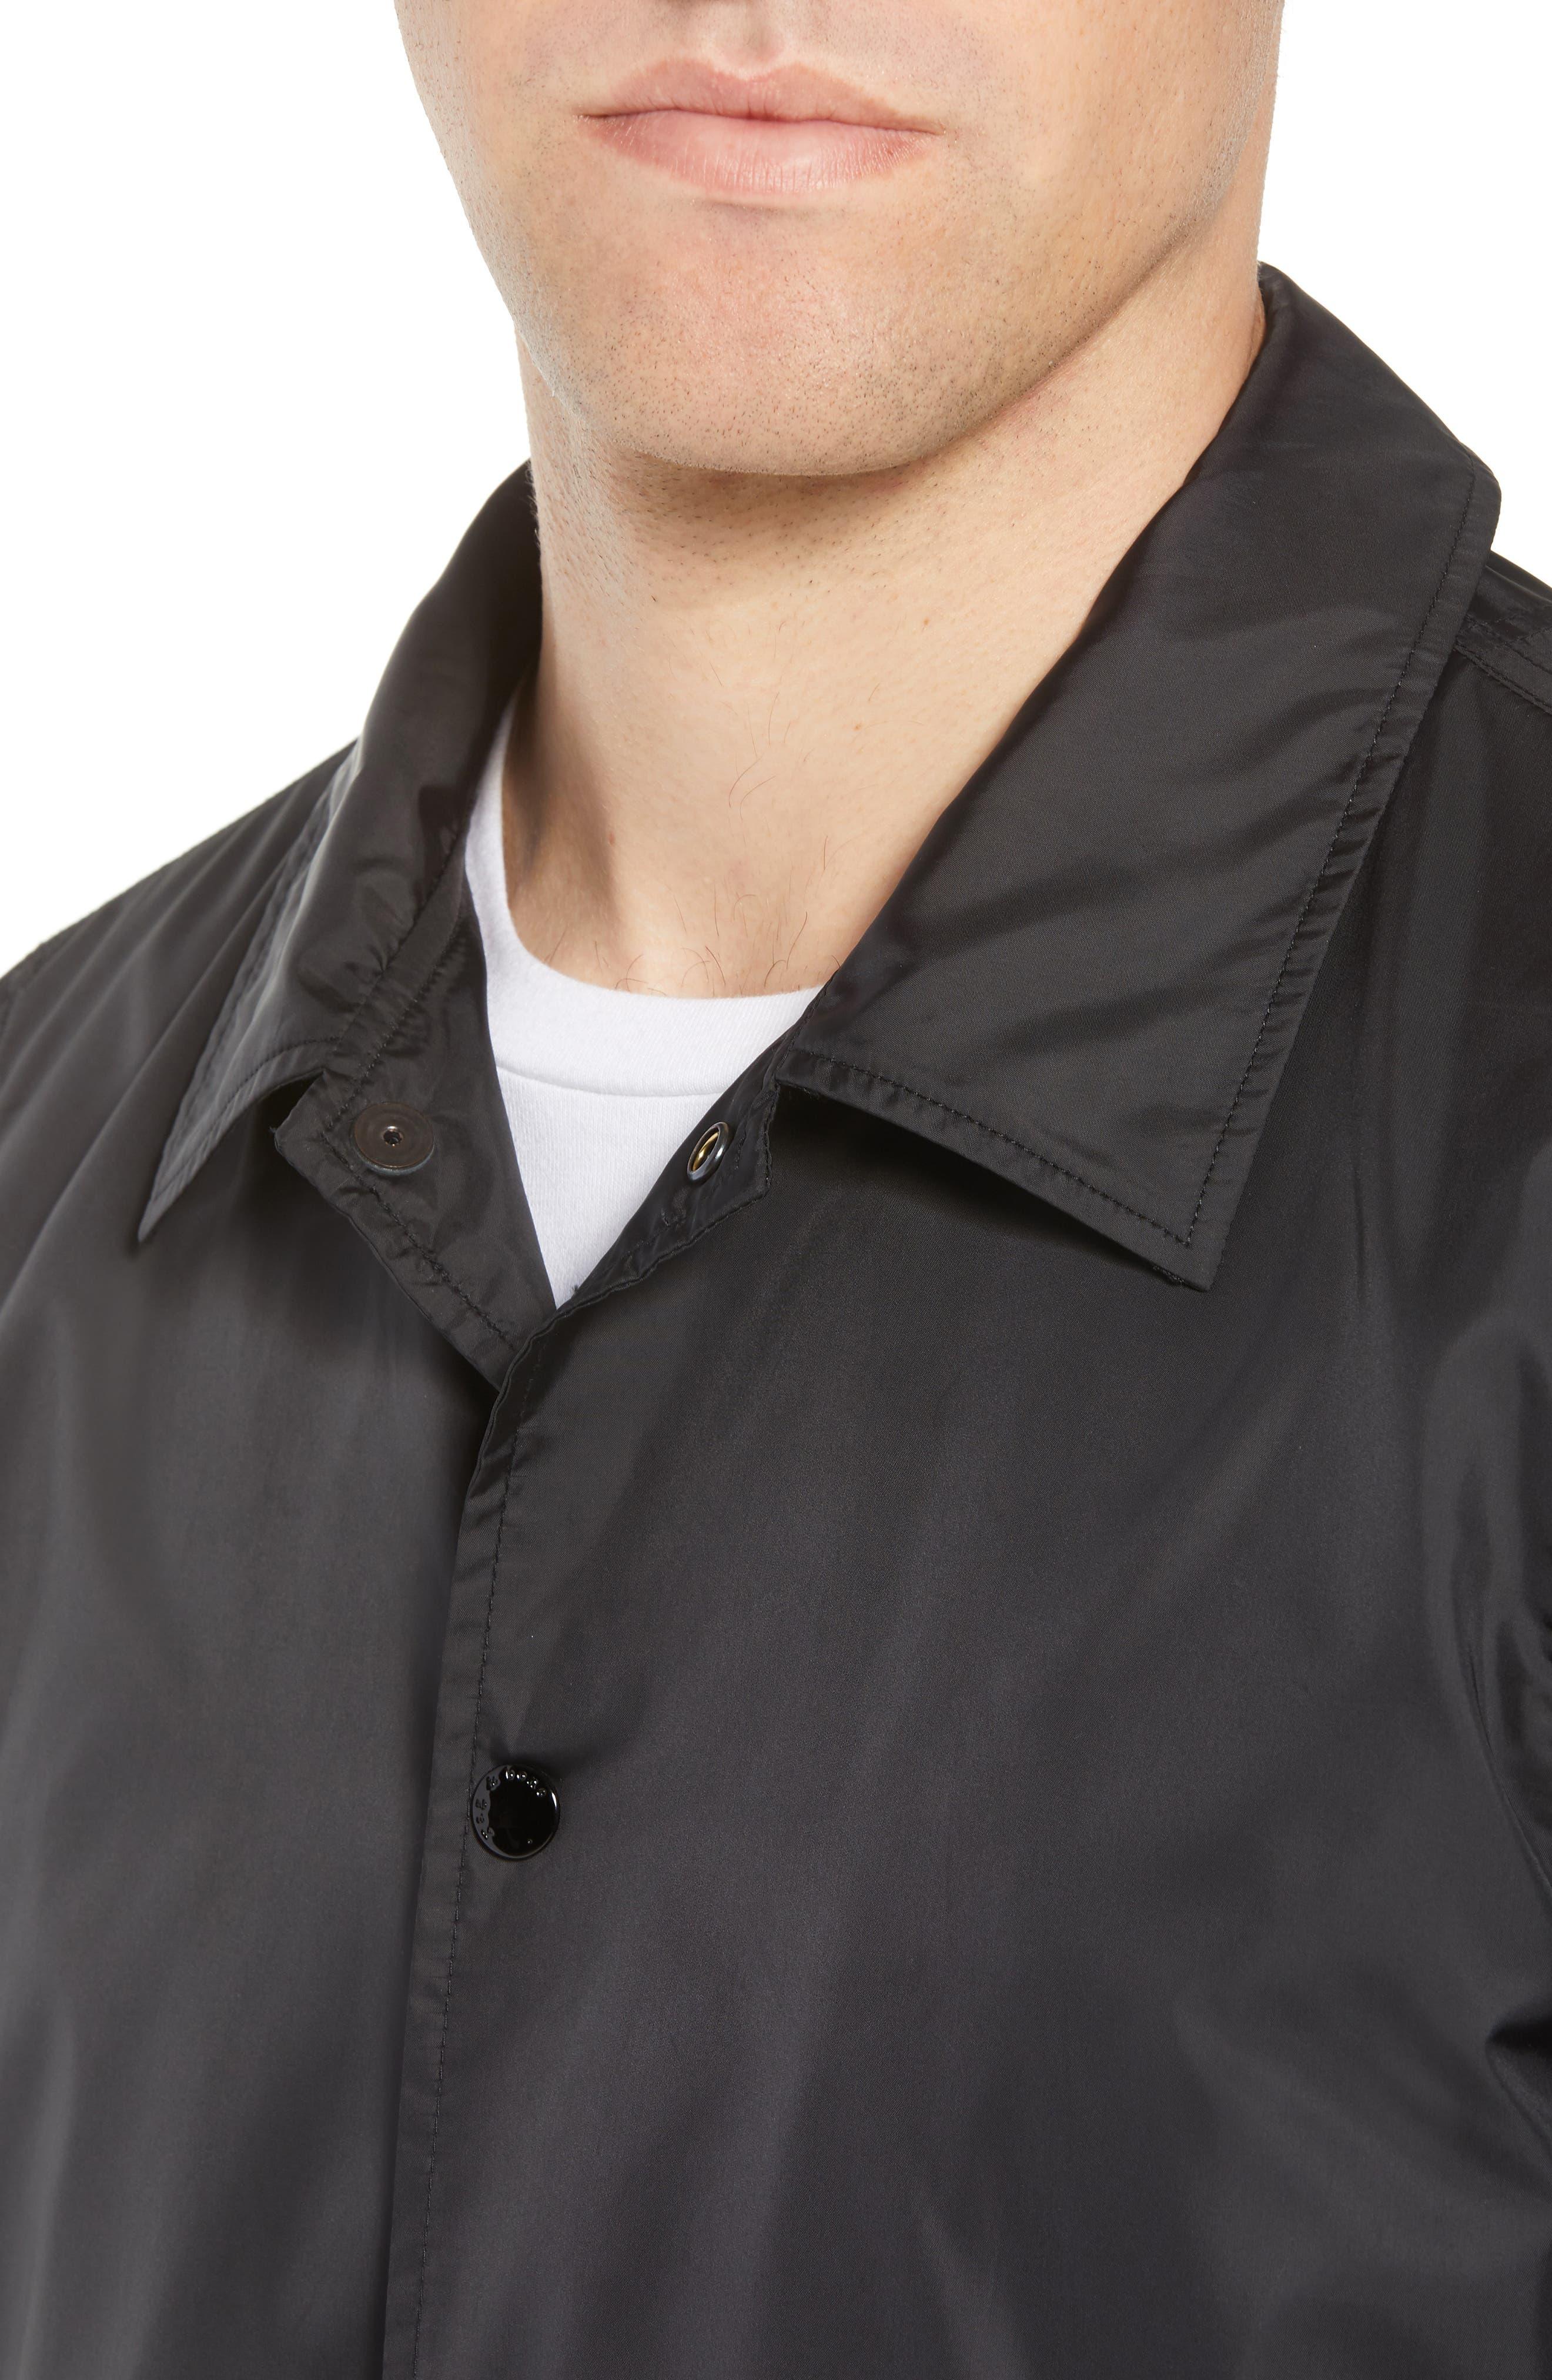 Coaches Jacket,                             Alternate thumbnail 4, color,                             Black